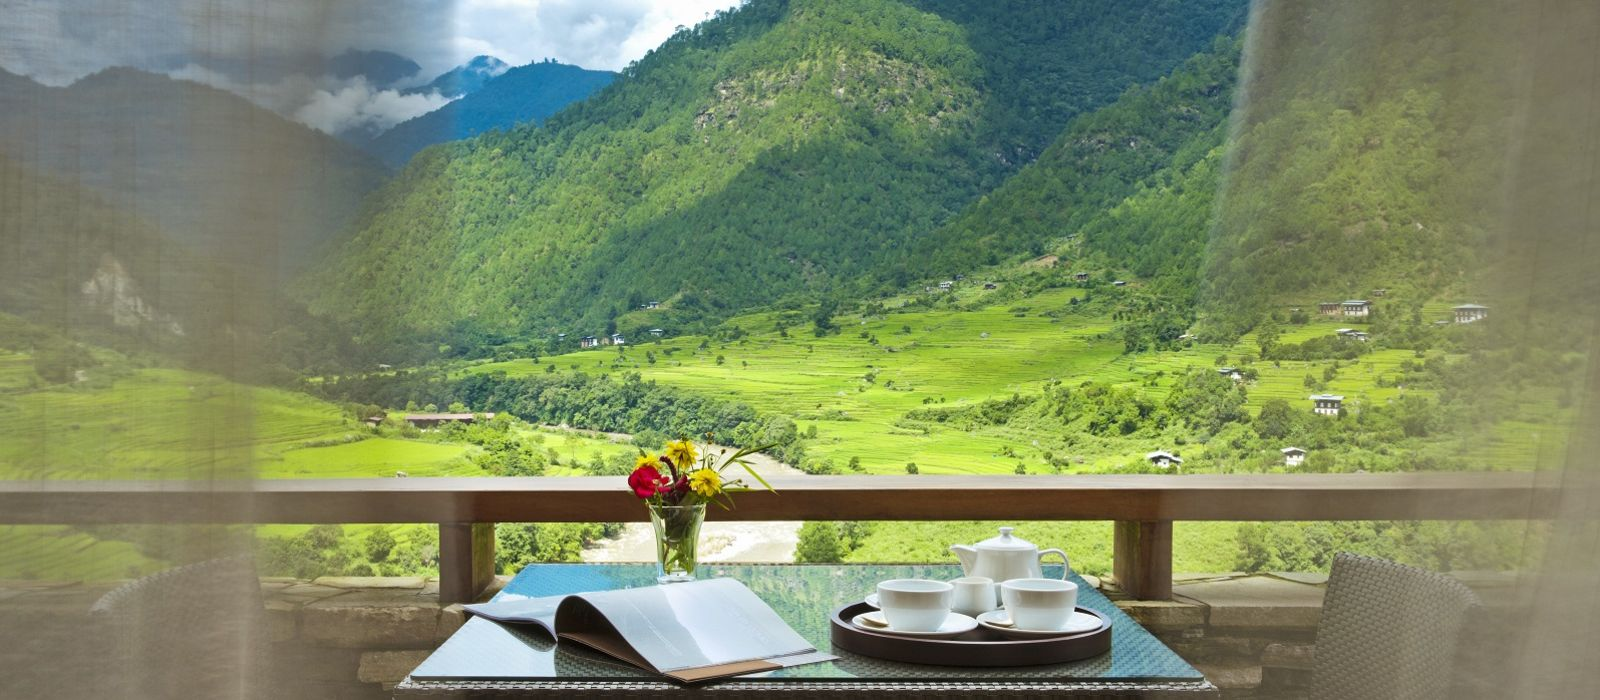 Exklusive Bhutan Luxusreise Urlaub 5